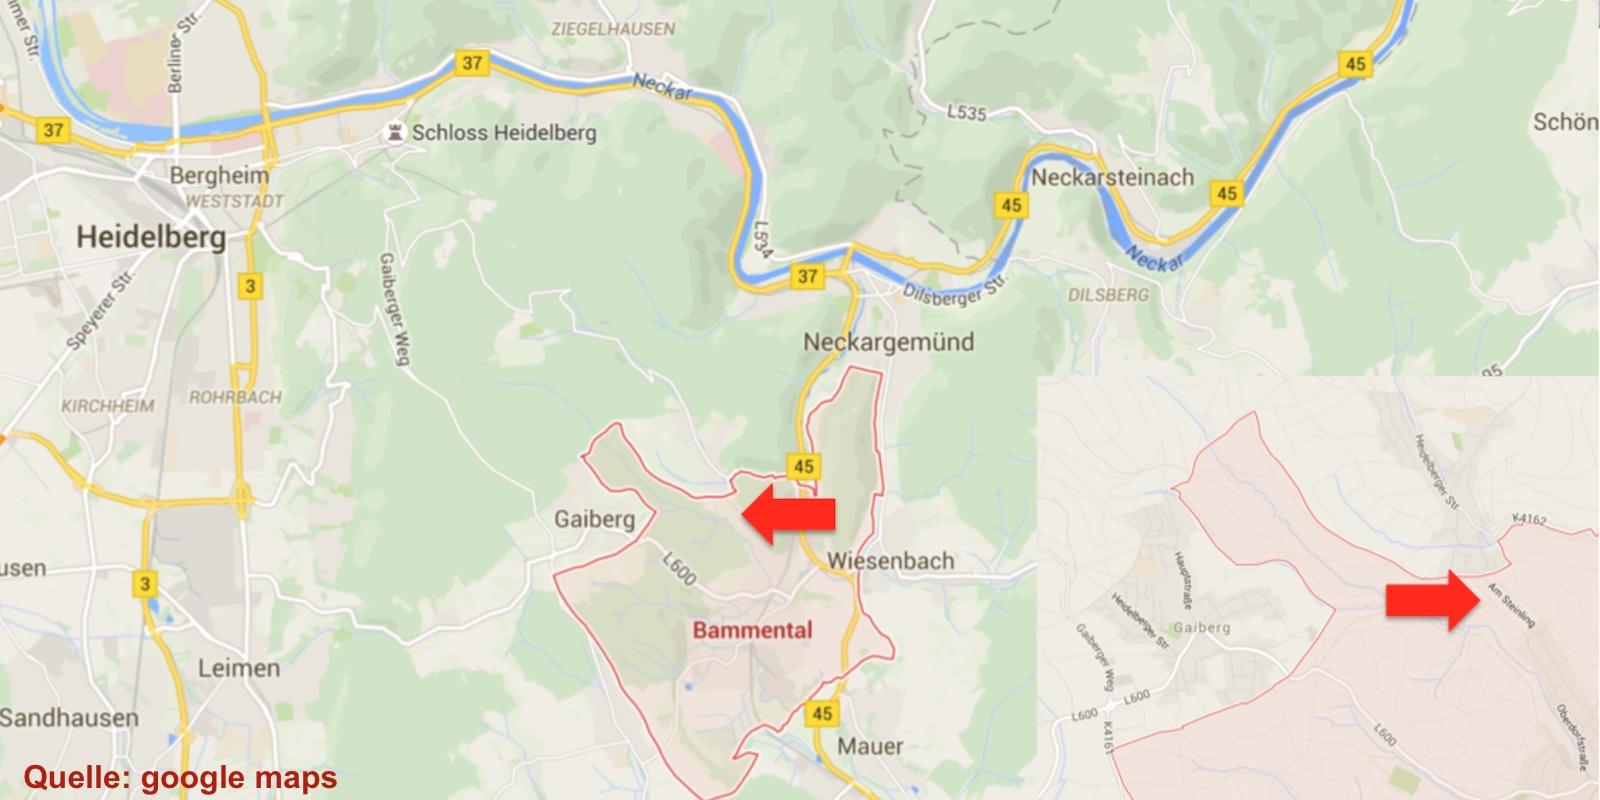 wunderbare Lage - nahe bei Heidelberg